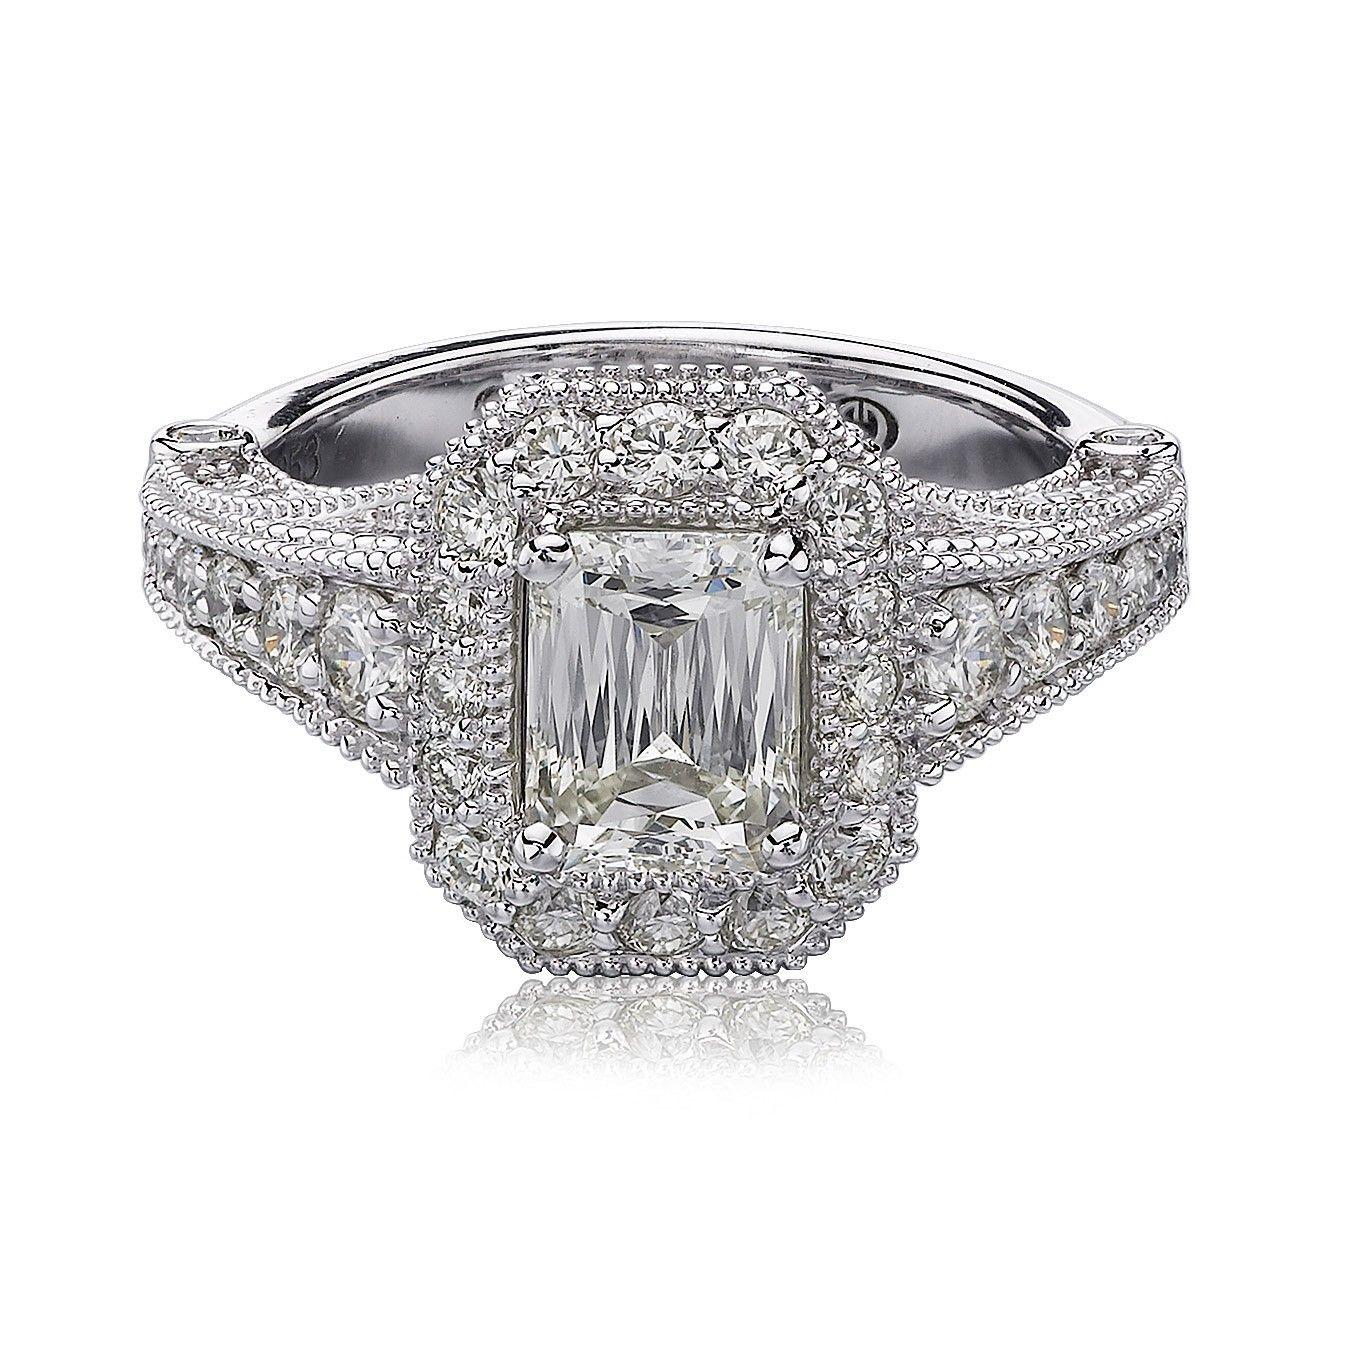 Christopher Designs Vintage Emerald Crisscut Diamond Engagement Ring